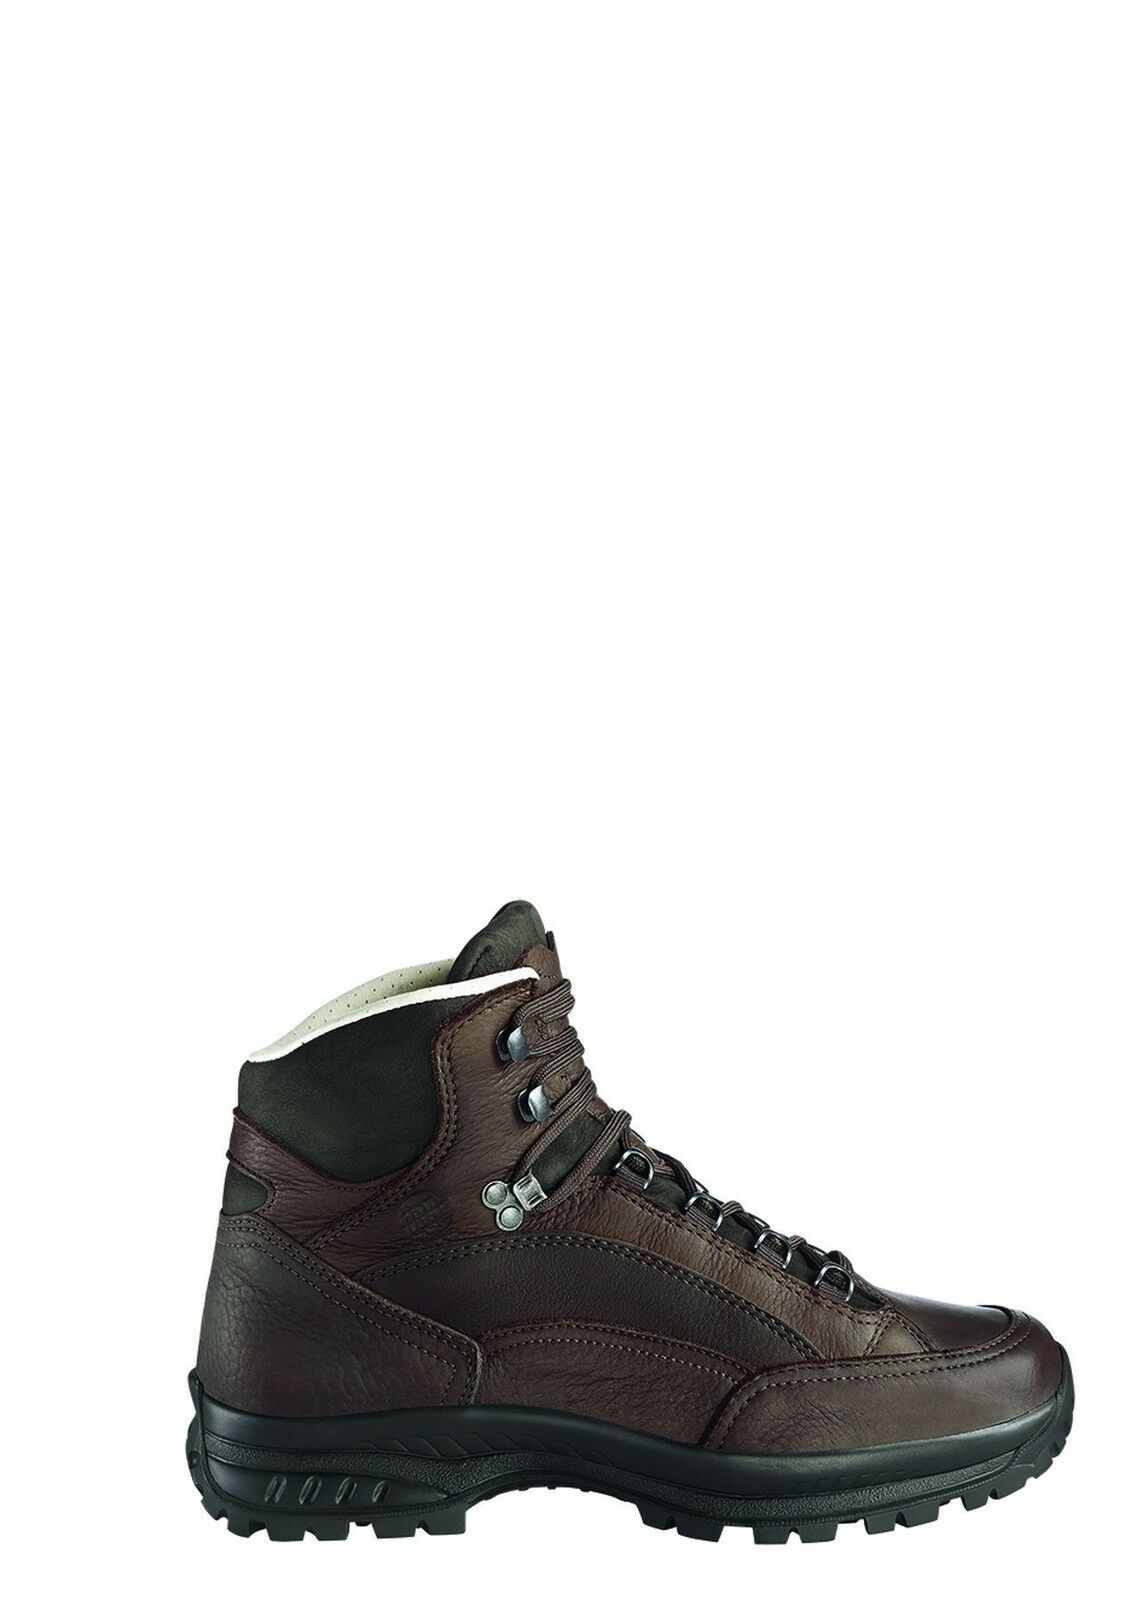 HANWAG Trekking Yak Schuhe Tingri Größe 7,5 - 41,5 marone  | Hervorragende Eigenschaften